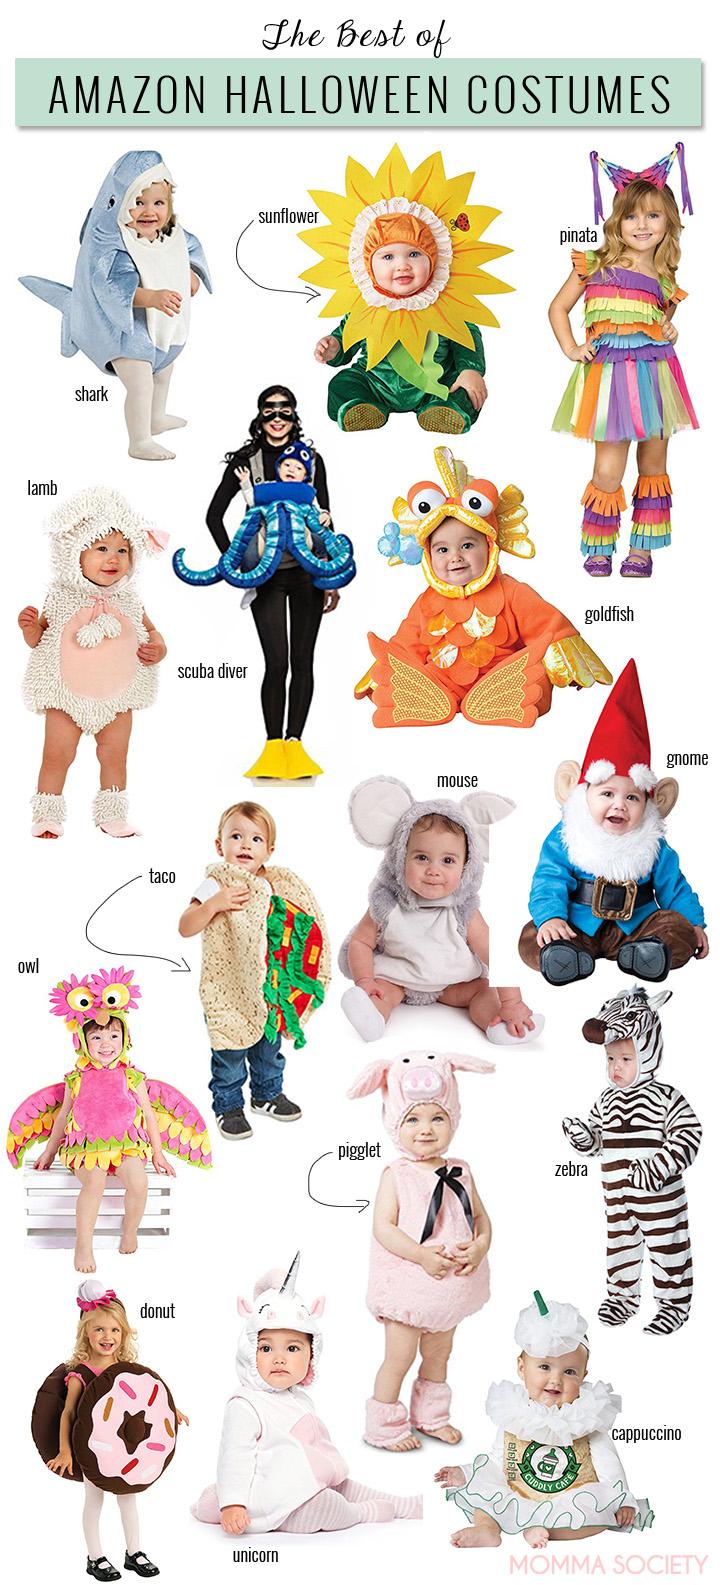 Best Halloween Costumes on Amazon | Toddler & Baby Halloween costumes | Costume Ideas | Halloween Costumes Infant | Halloween Costumes Family